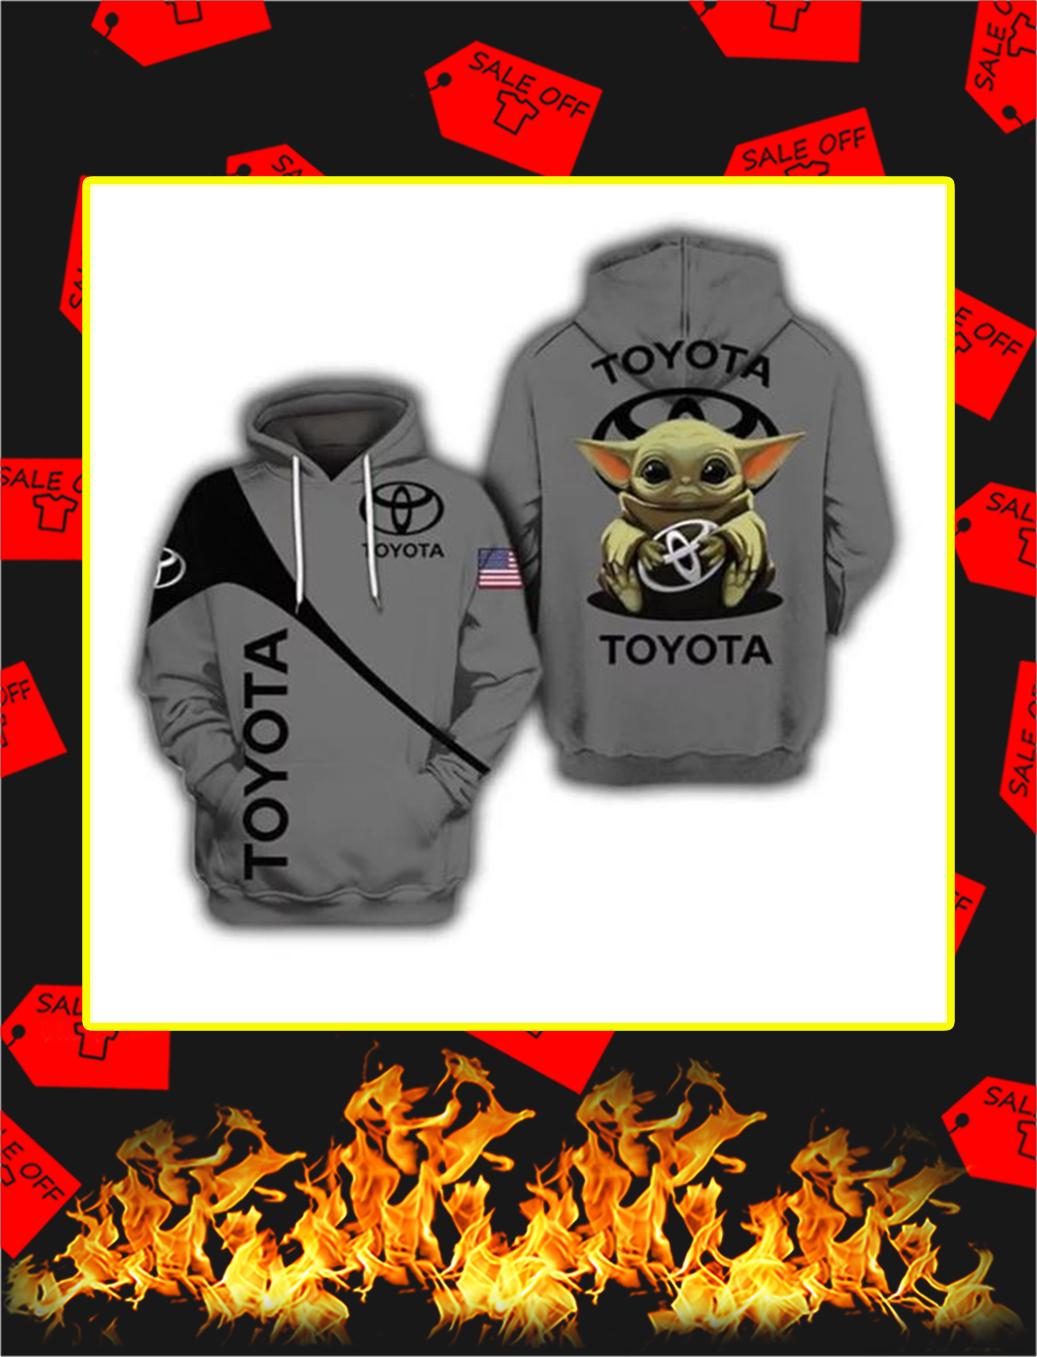 Baby Yoda toyota 3d hoodie - L